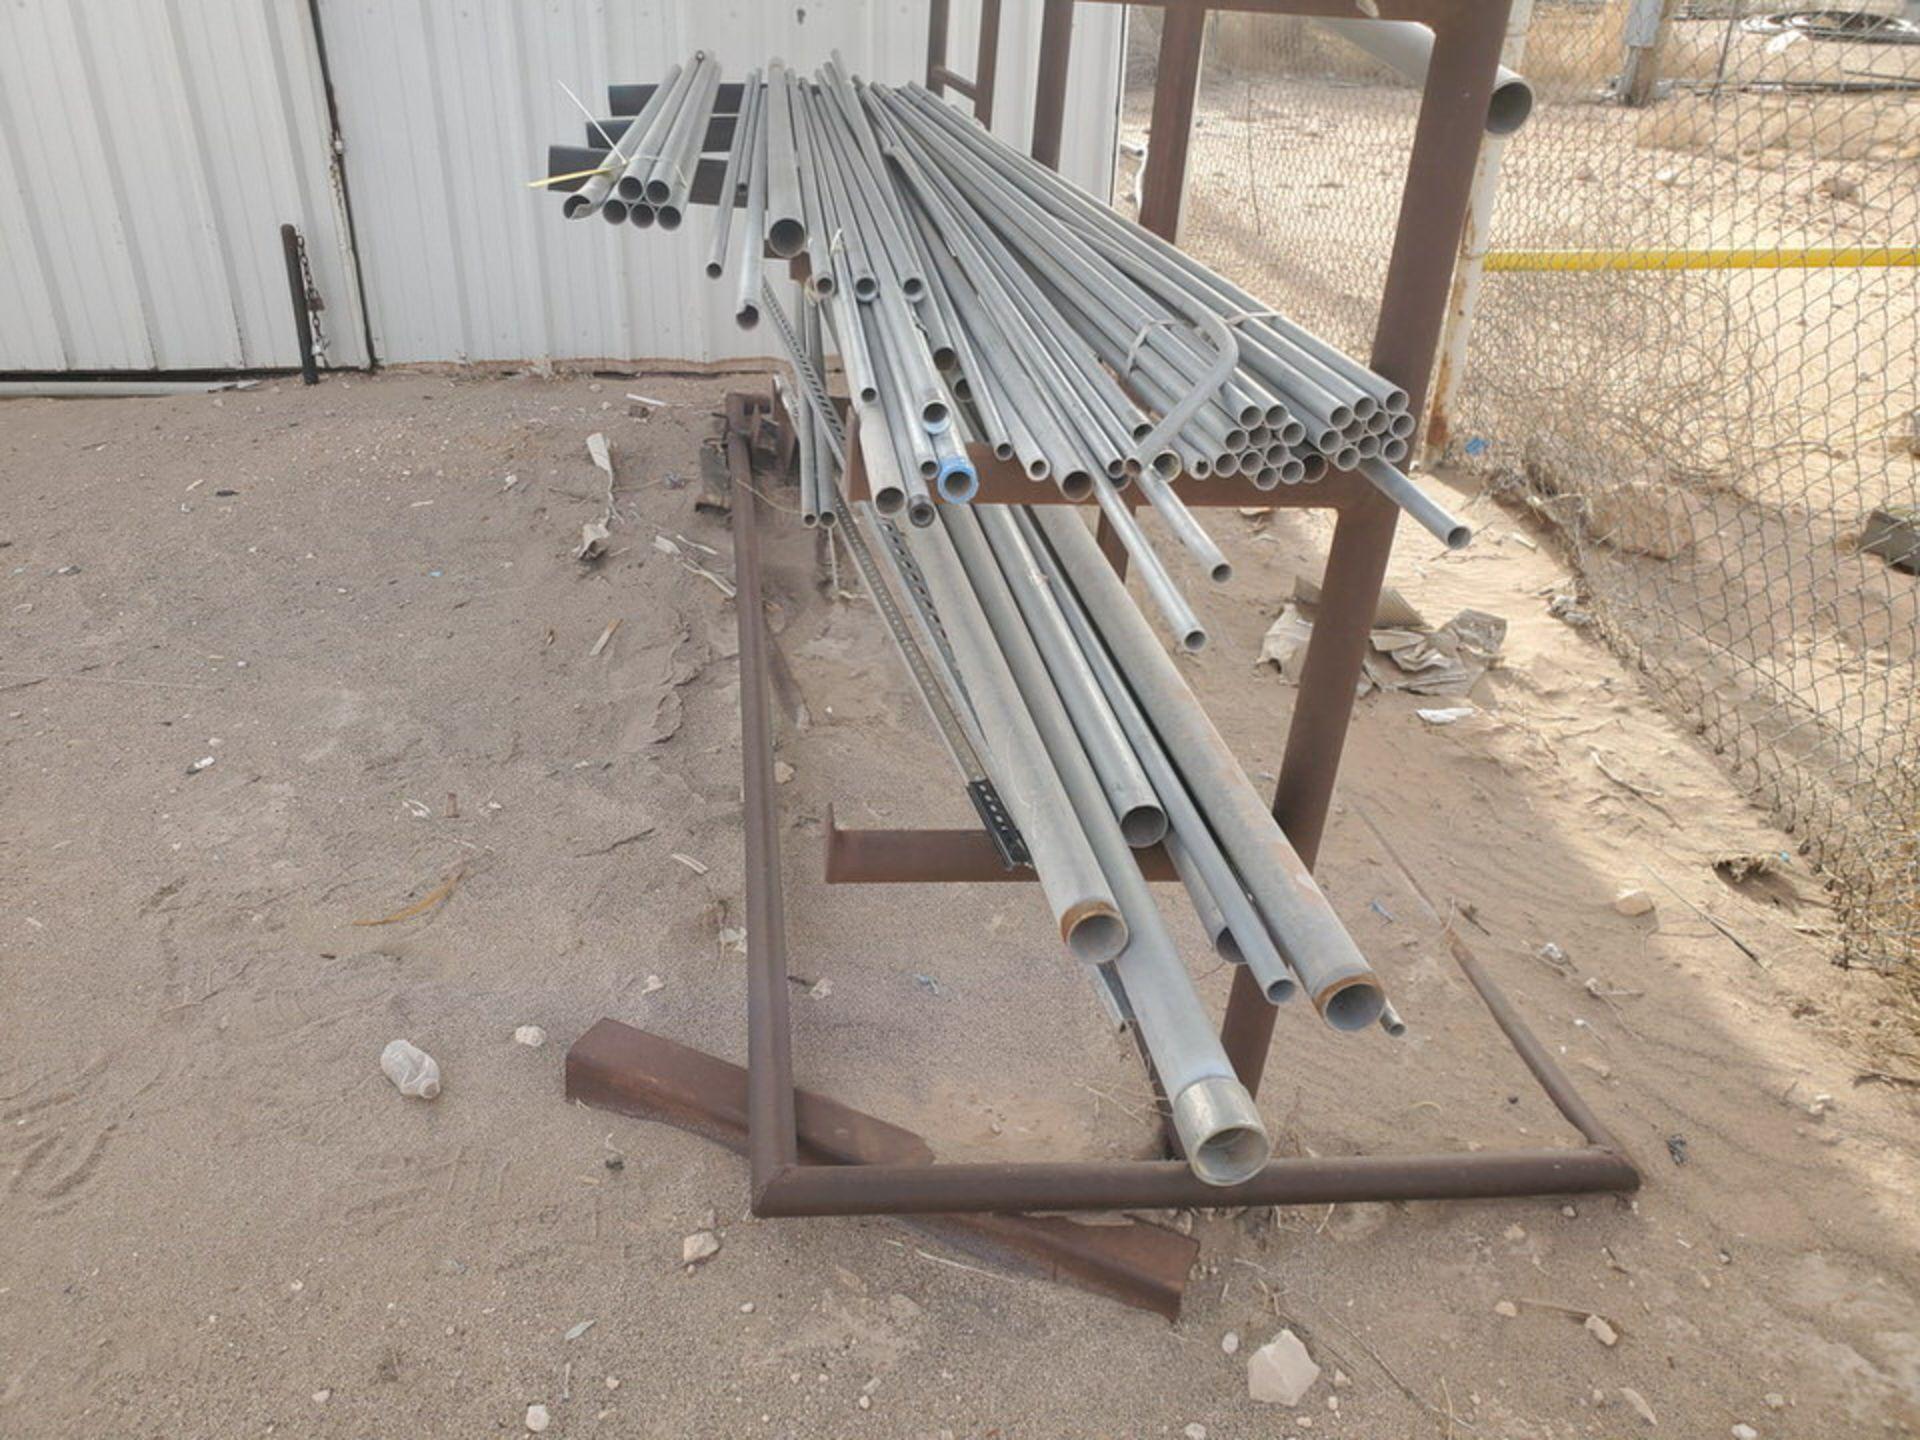 "PVC & Alum. Pipe W/ Conduit Size Range: 1/2"" - 4"" W/ Rack - Image 3 of 18"